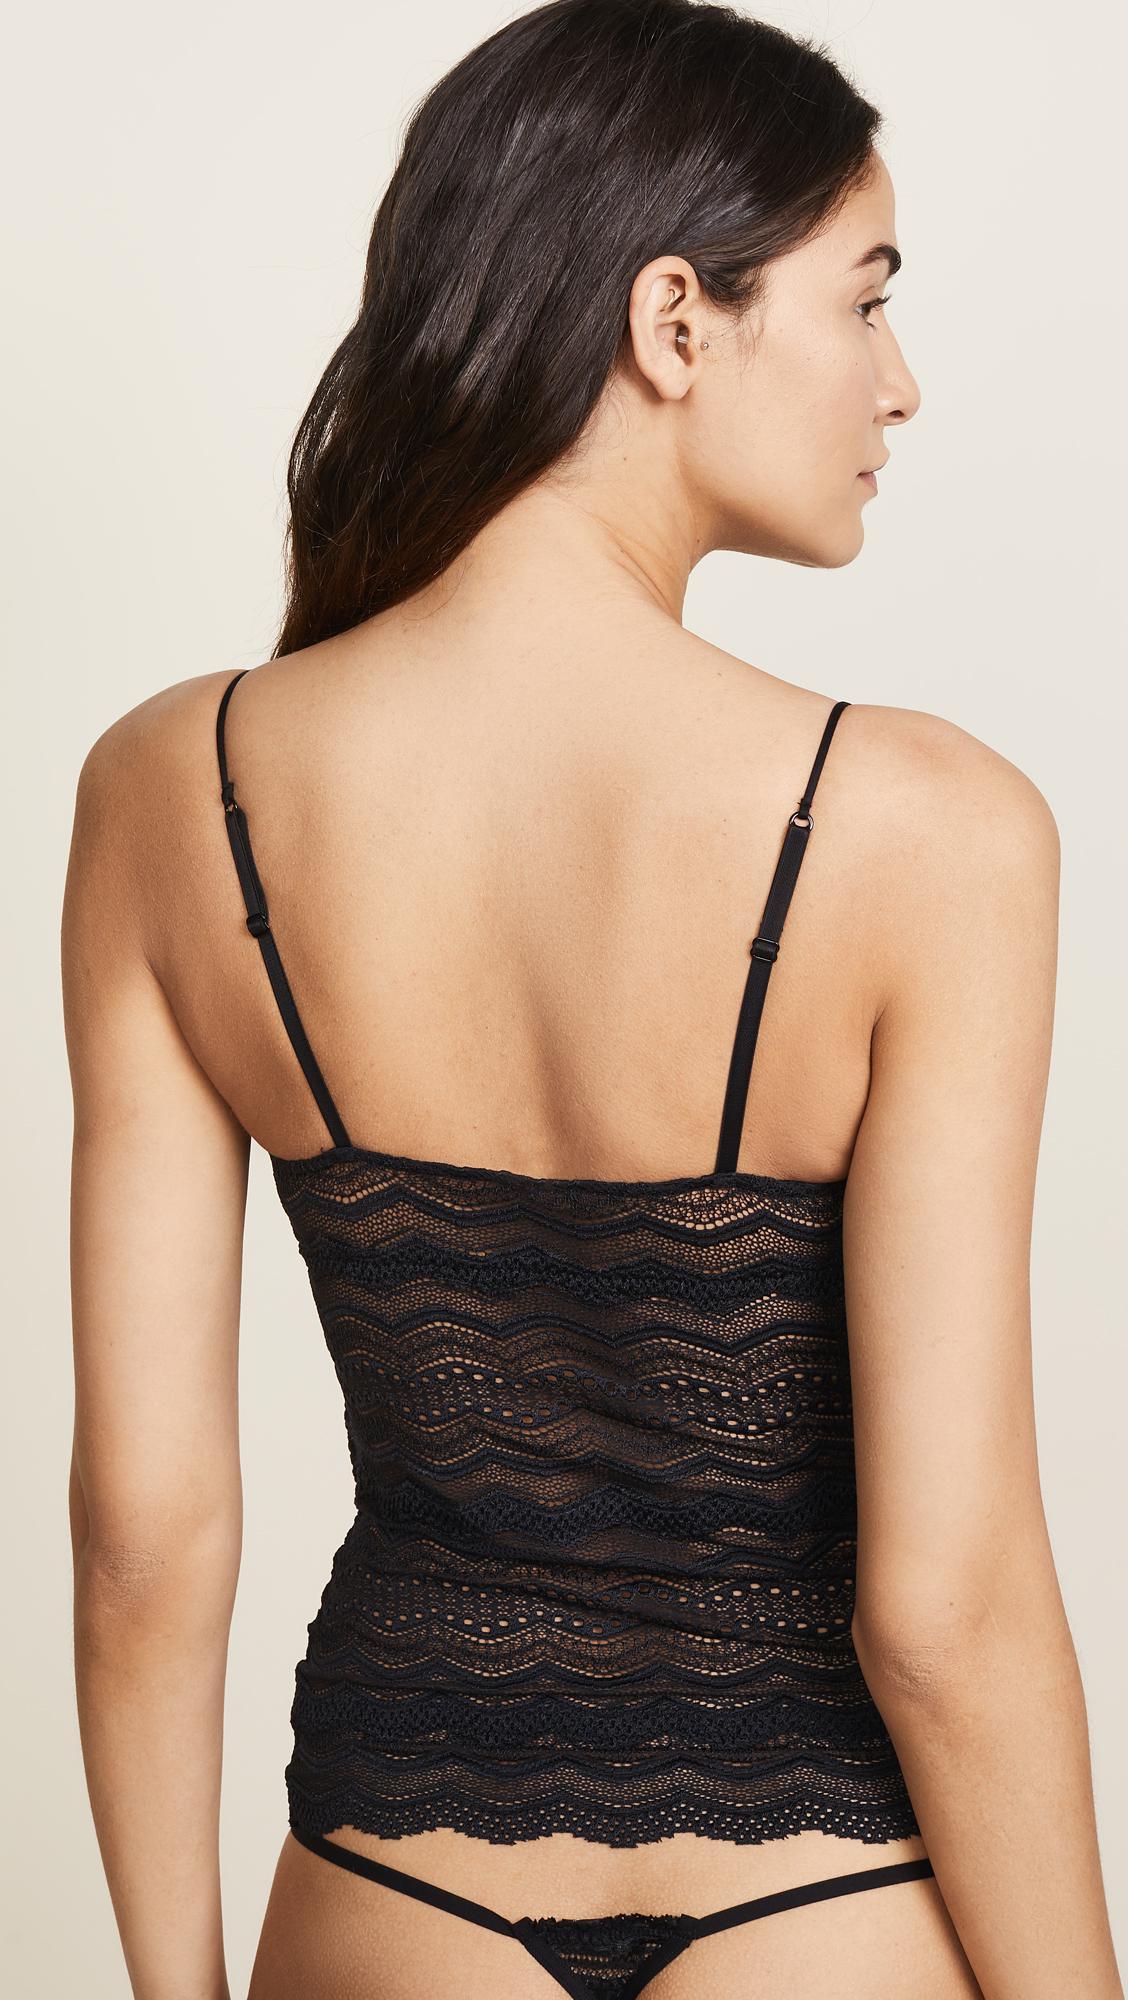 88efd461d468b Cosabella Ceylon Long Camisole in Black - Save 7% - Lyst